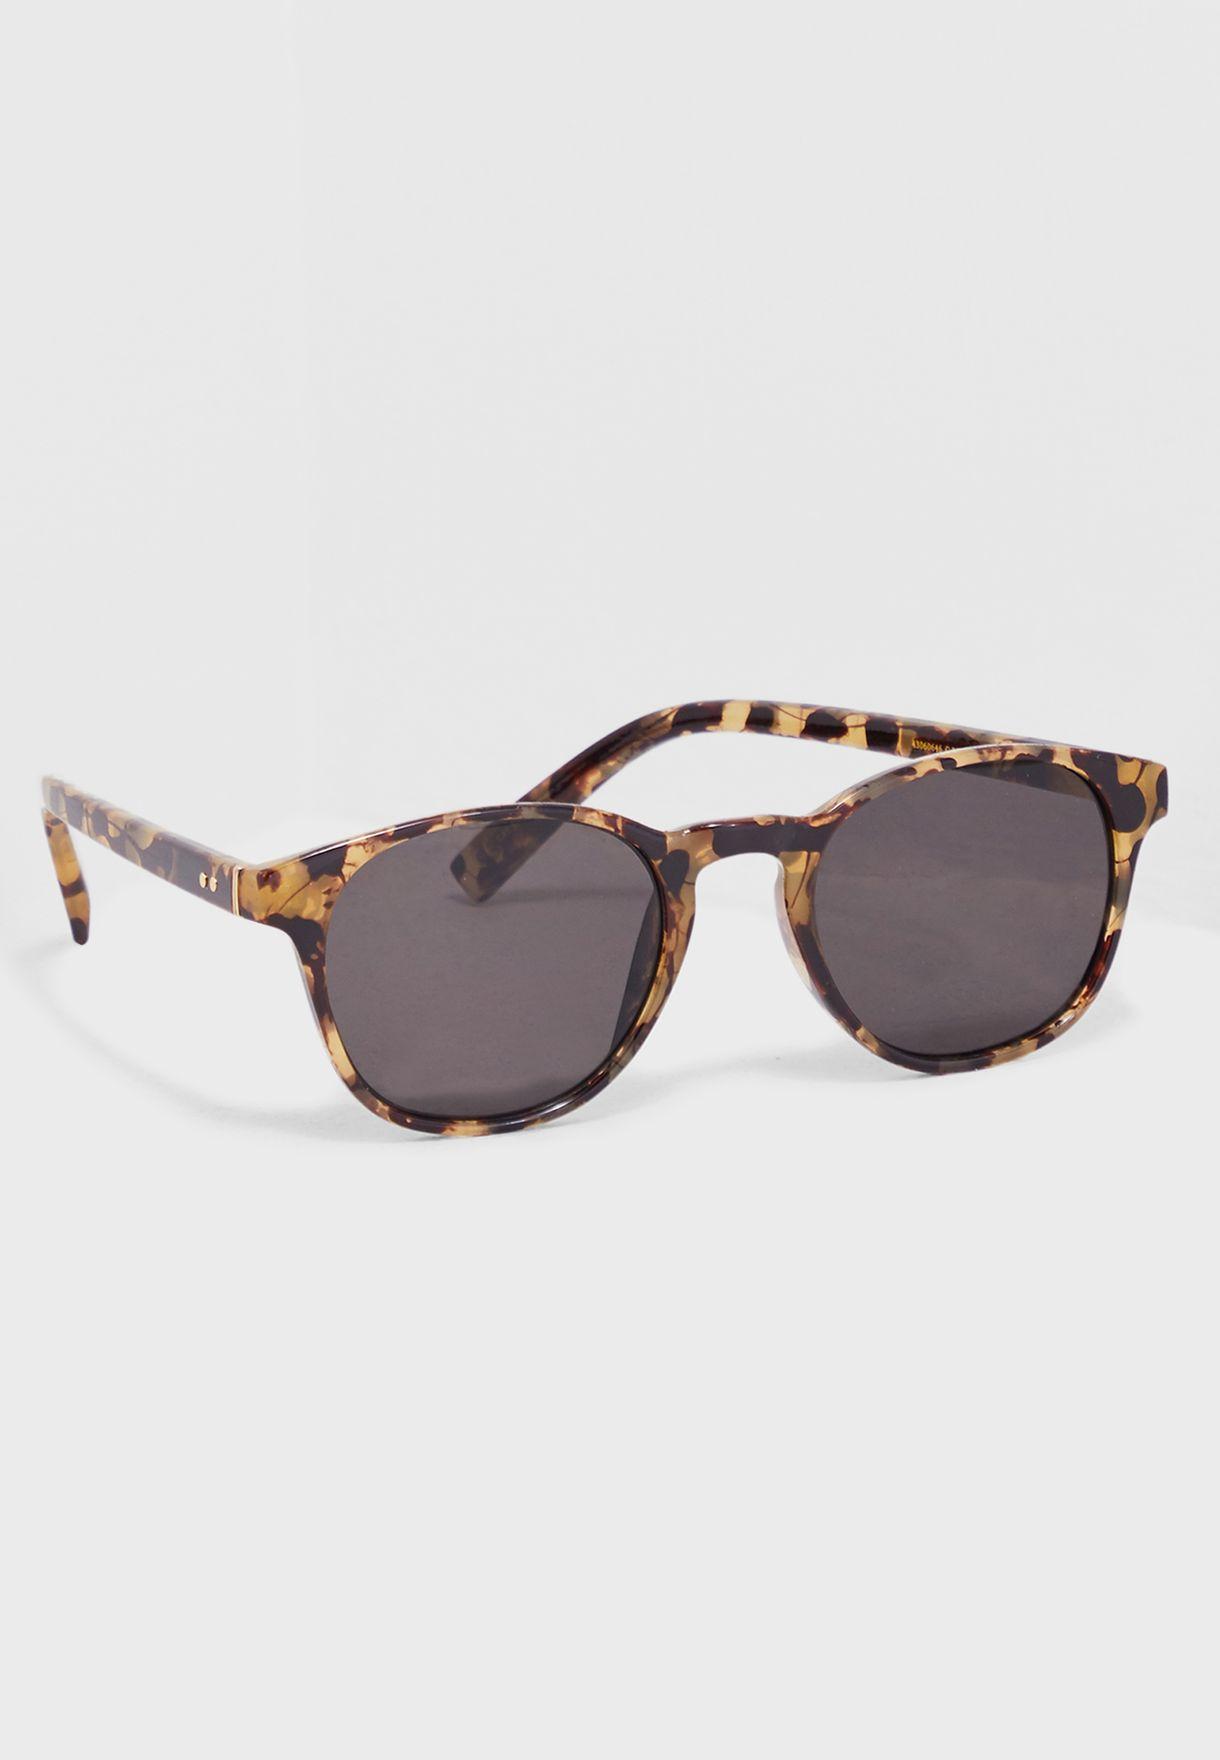 6a49a45d4b Shop Mango Man prints Tortoiseshell retro sunglasses 43060646 for ...